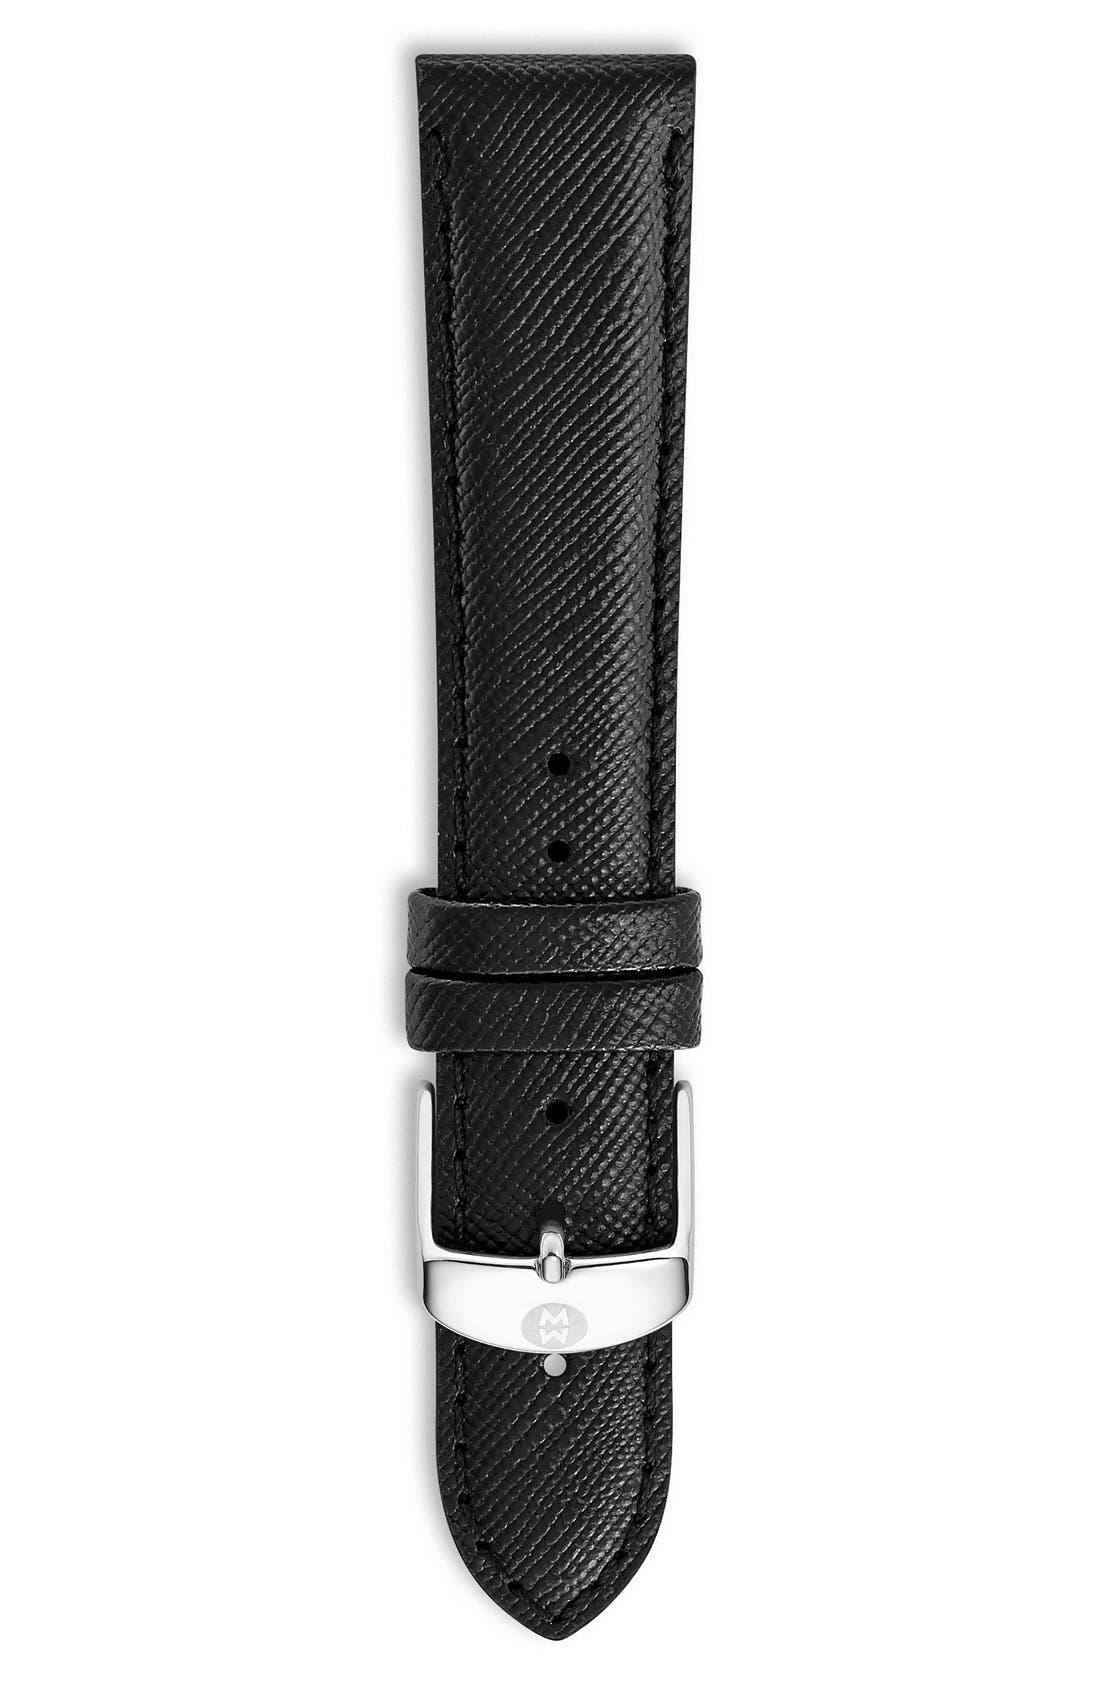 Main Image - MICHELE 18mm Saffiano Leather Watch Strap